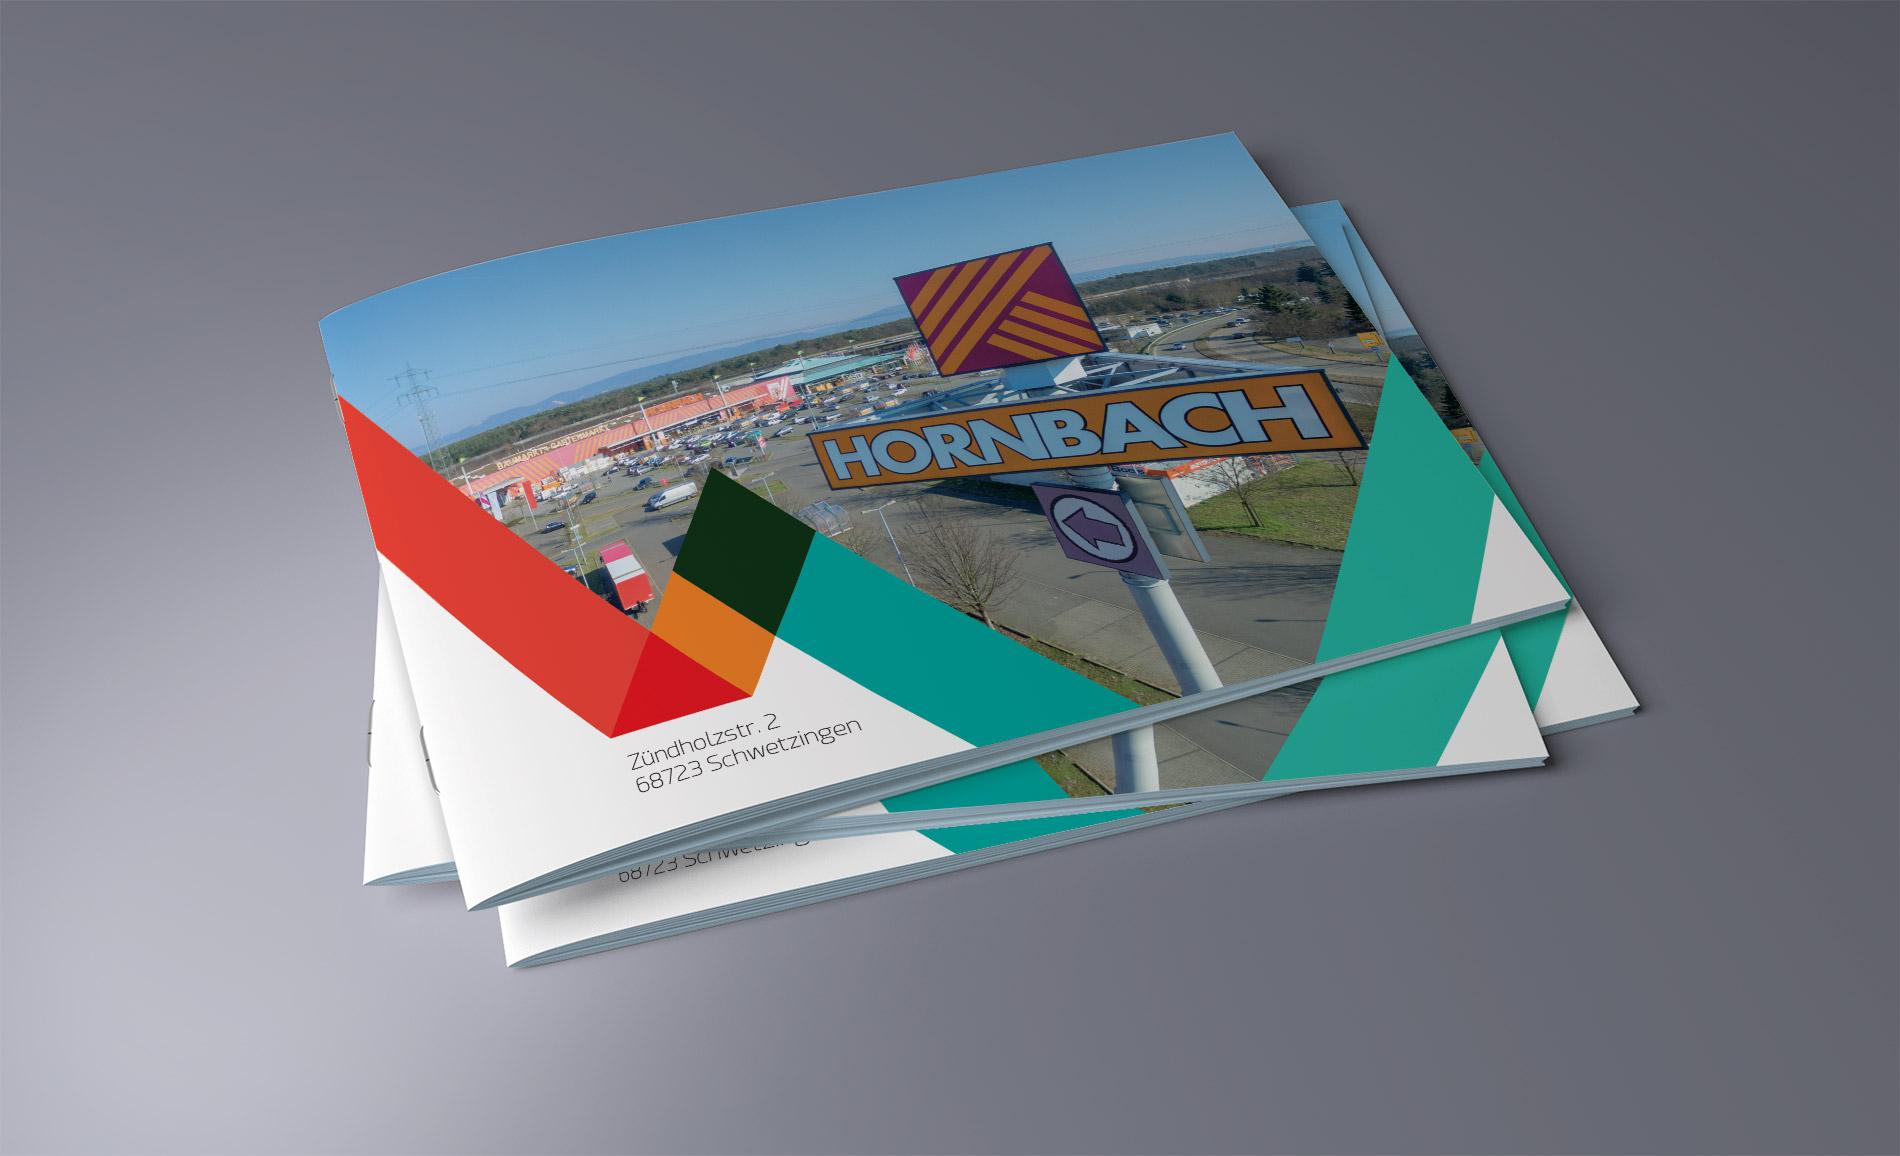 Hornbach Broschüre A4 - Grafikdesign/Printdesign